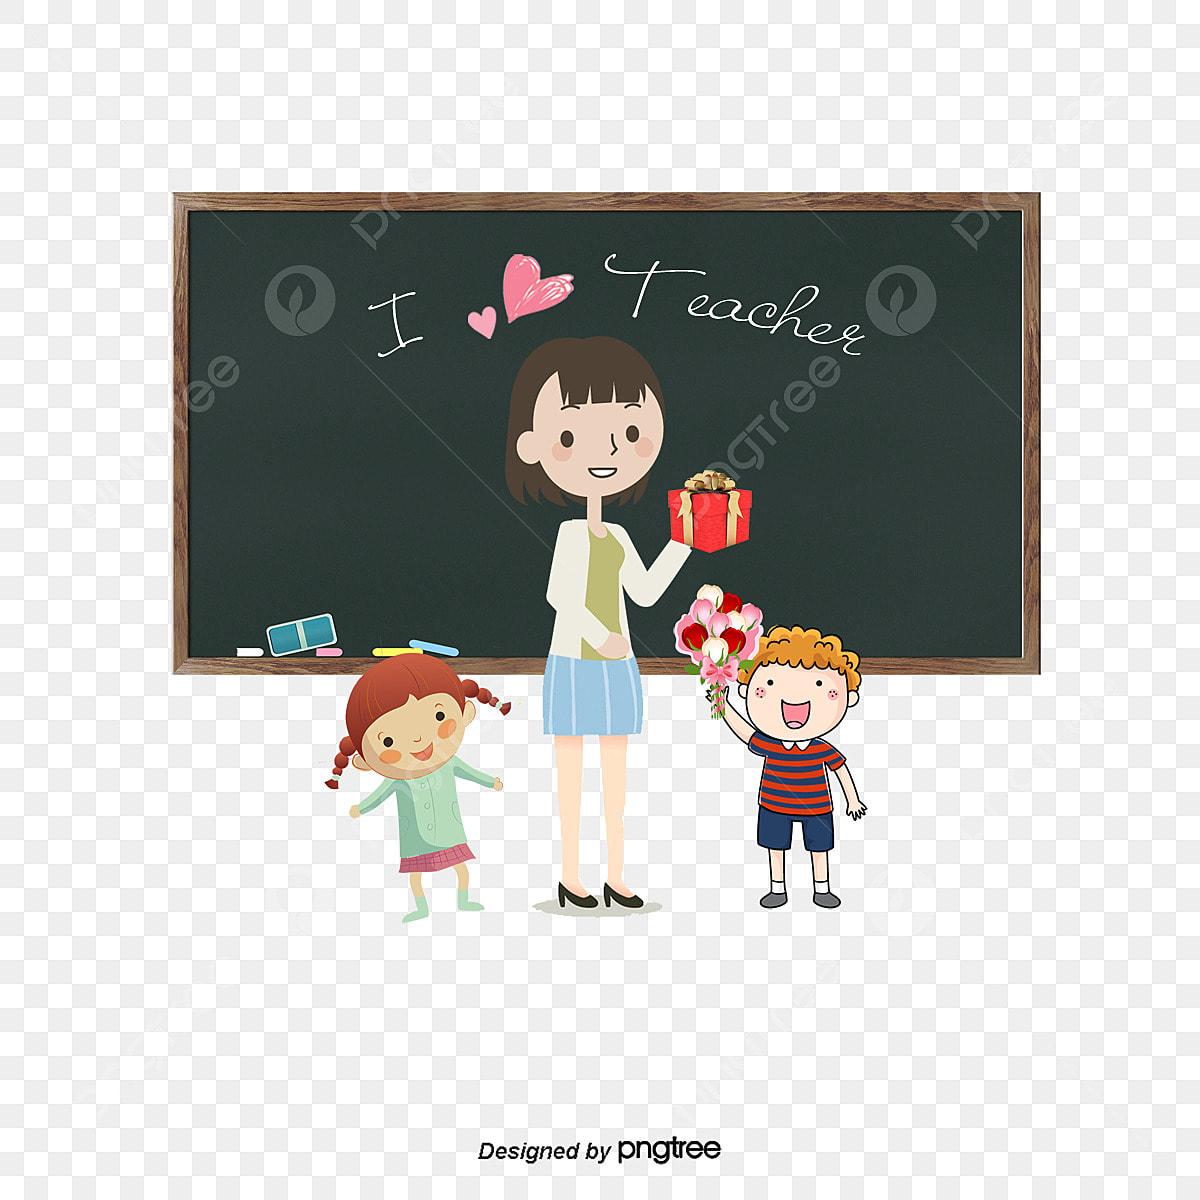 Kartun Guru Guru Dan Pelajar Pelajar Kartun Watak Kartun